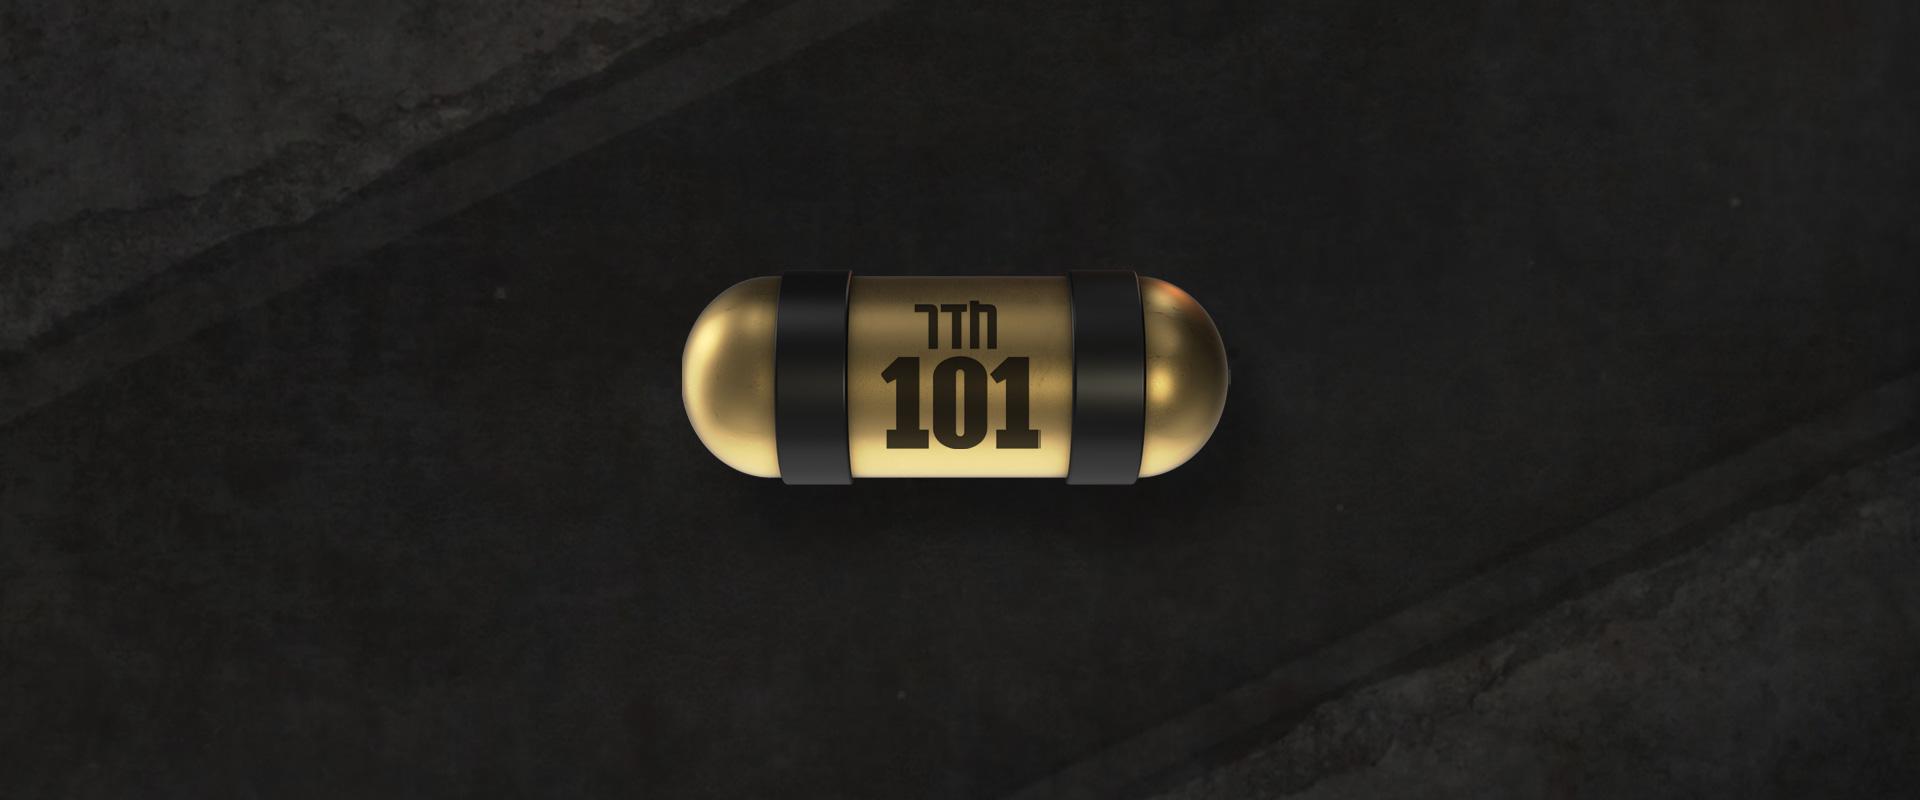 חדר 101